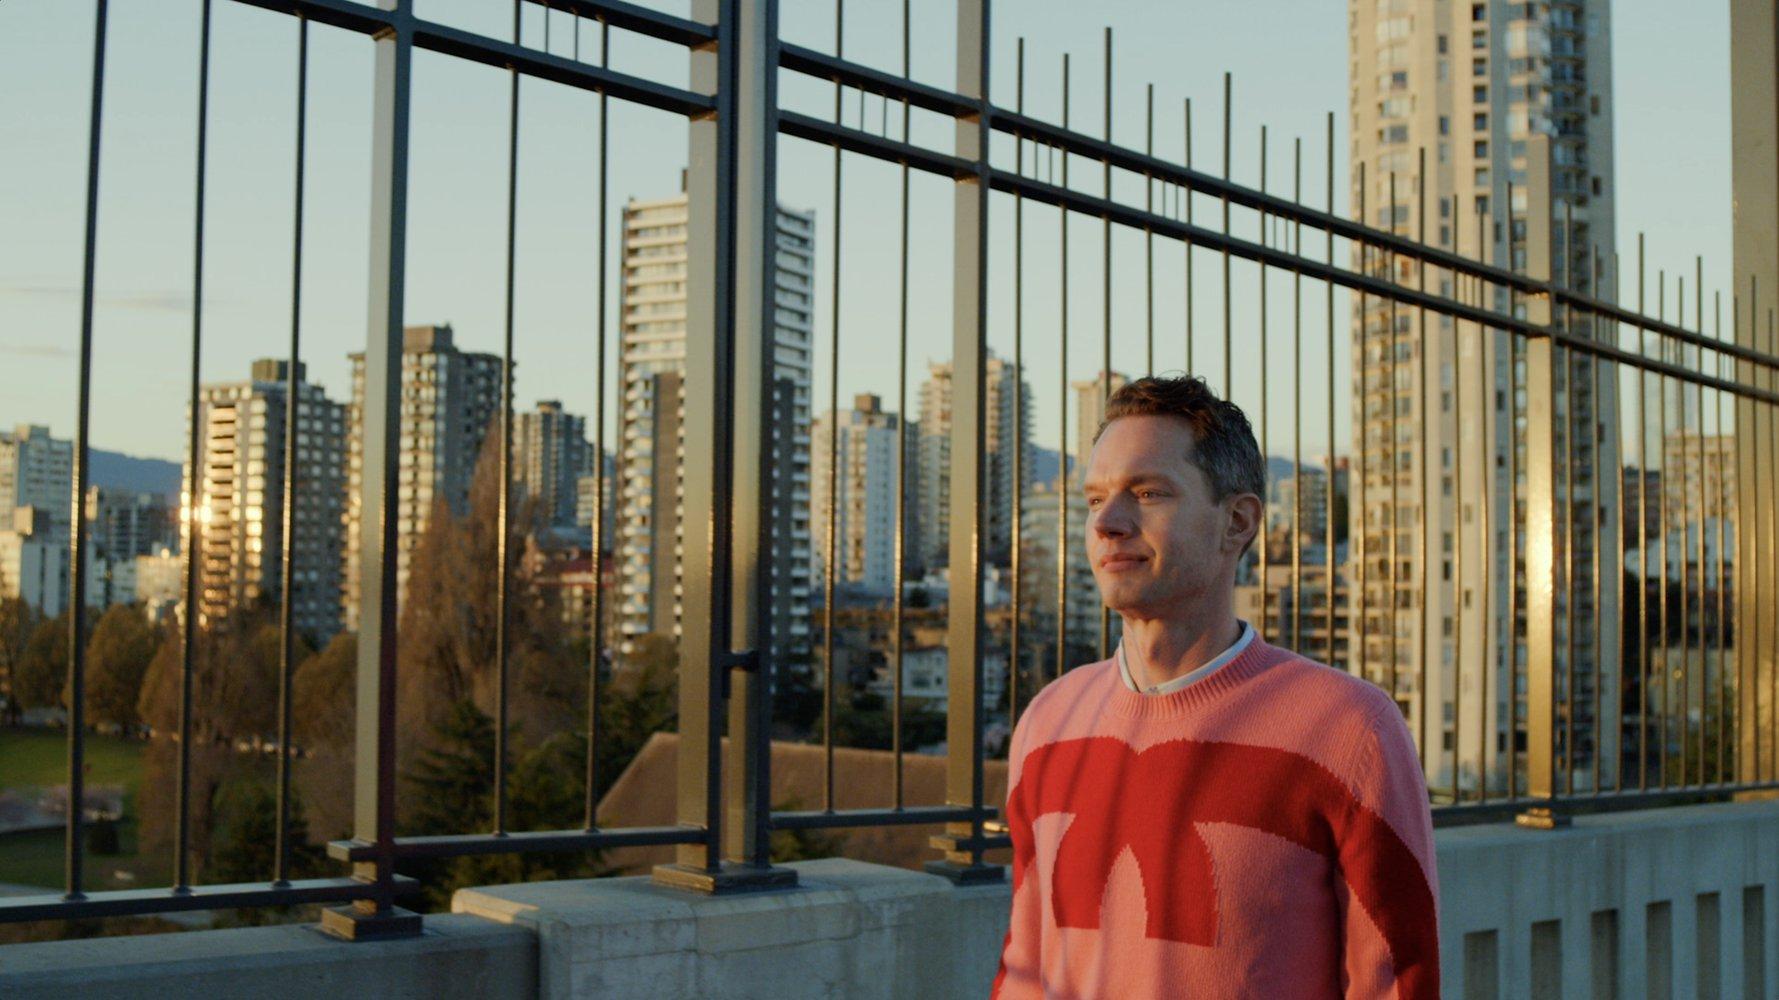 Lyle XOX as Lyle Reimer walking through Vancouver, BC